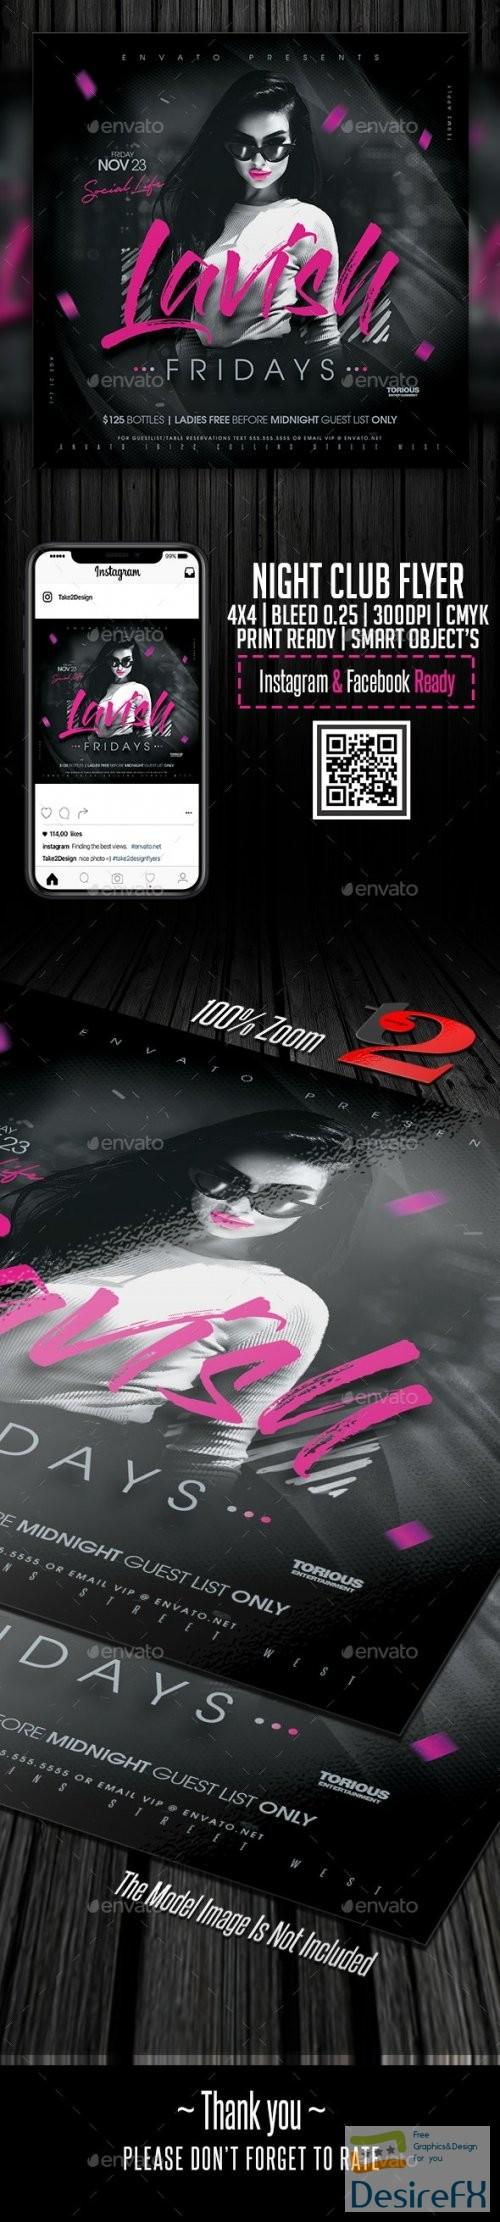 layered-psd - Night Club Flyer Template 24274527